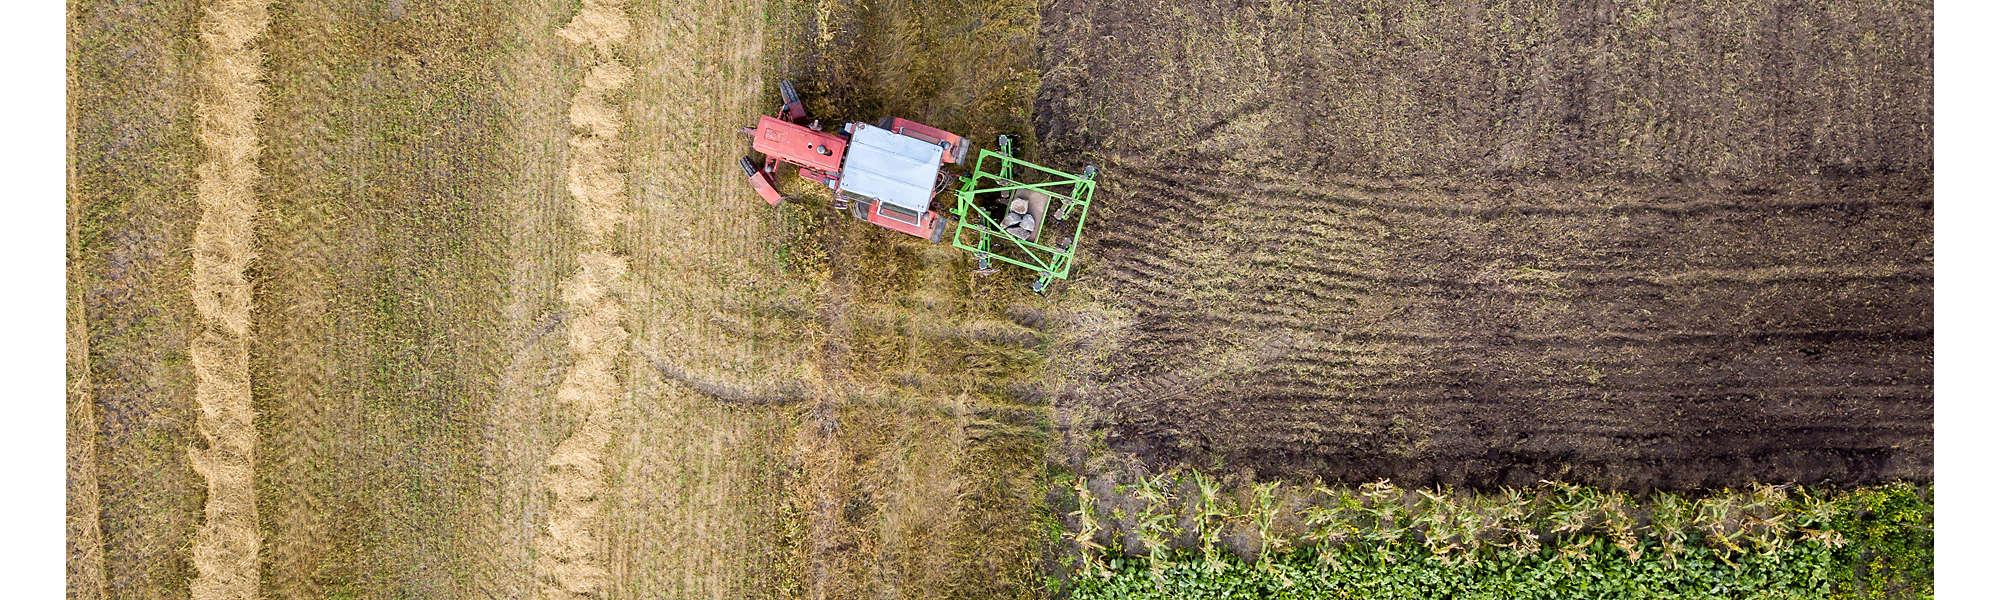 Farm machinery tractor crops aerial